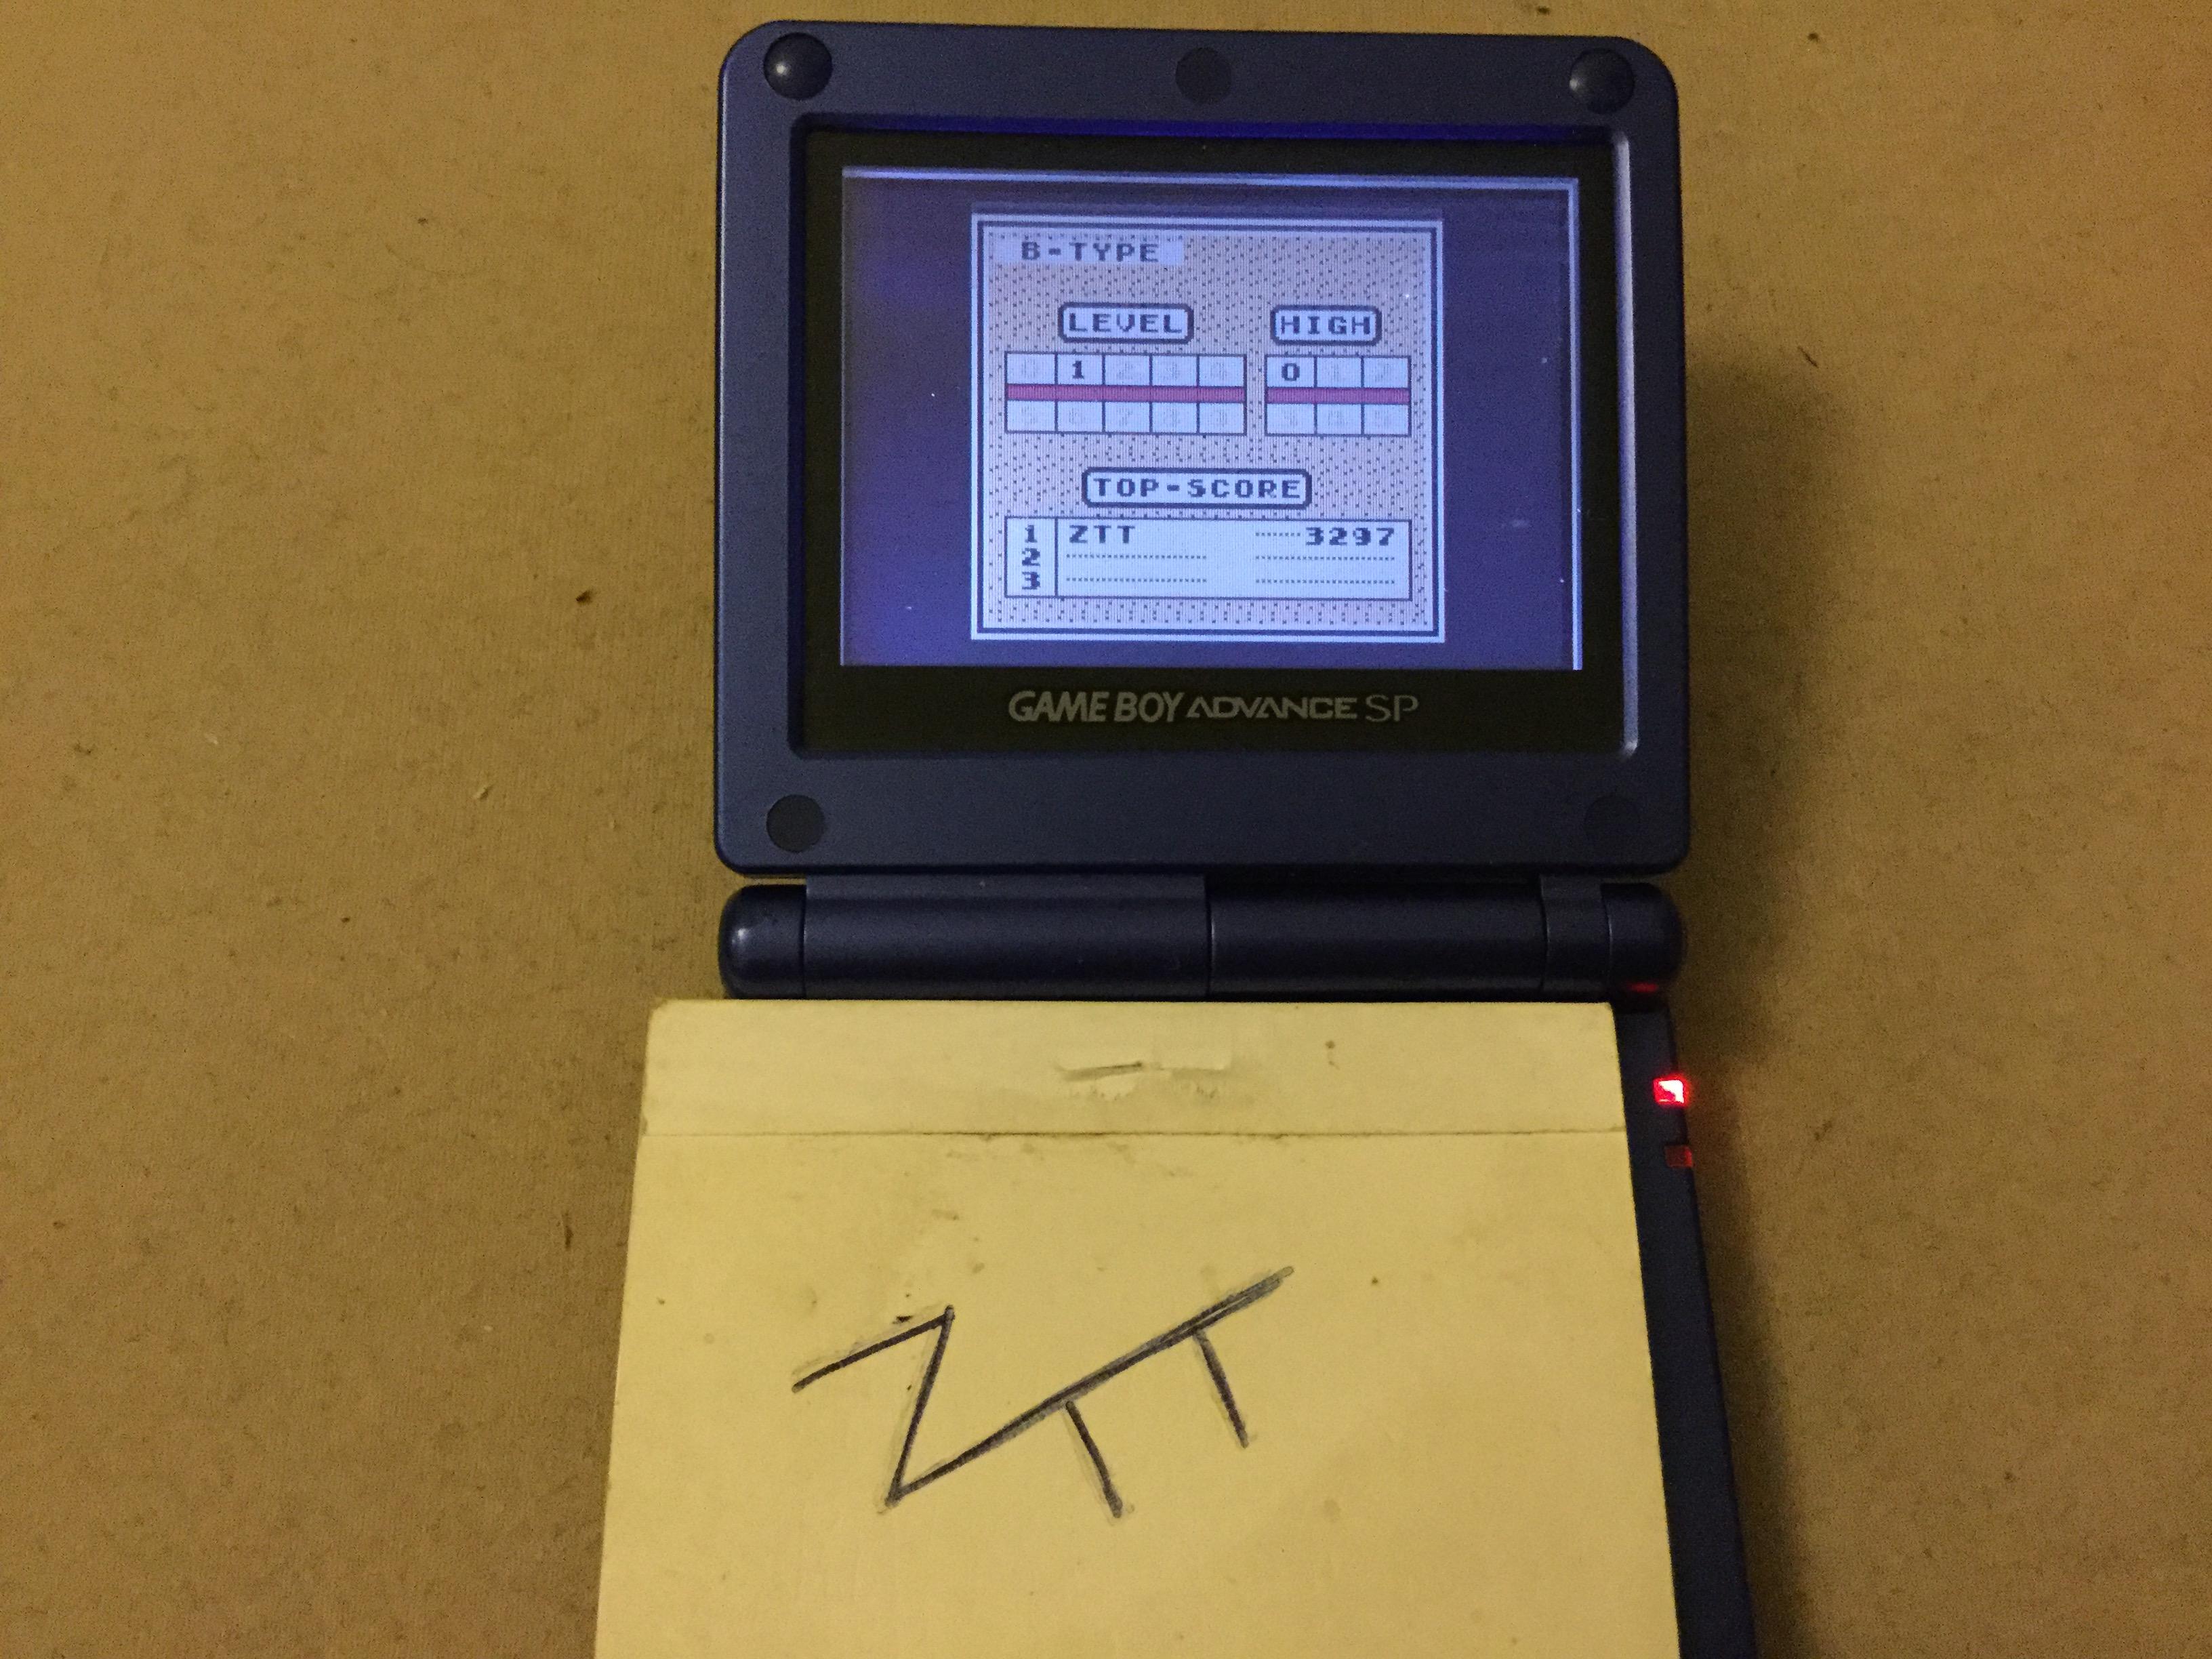 Frankie: Tetris: Type B [Level 1 / High 0] (Game Boy) 3,297 points on 2019-11-13 12:34:52